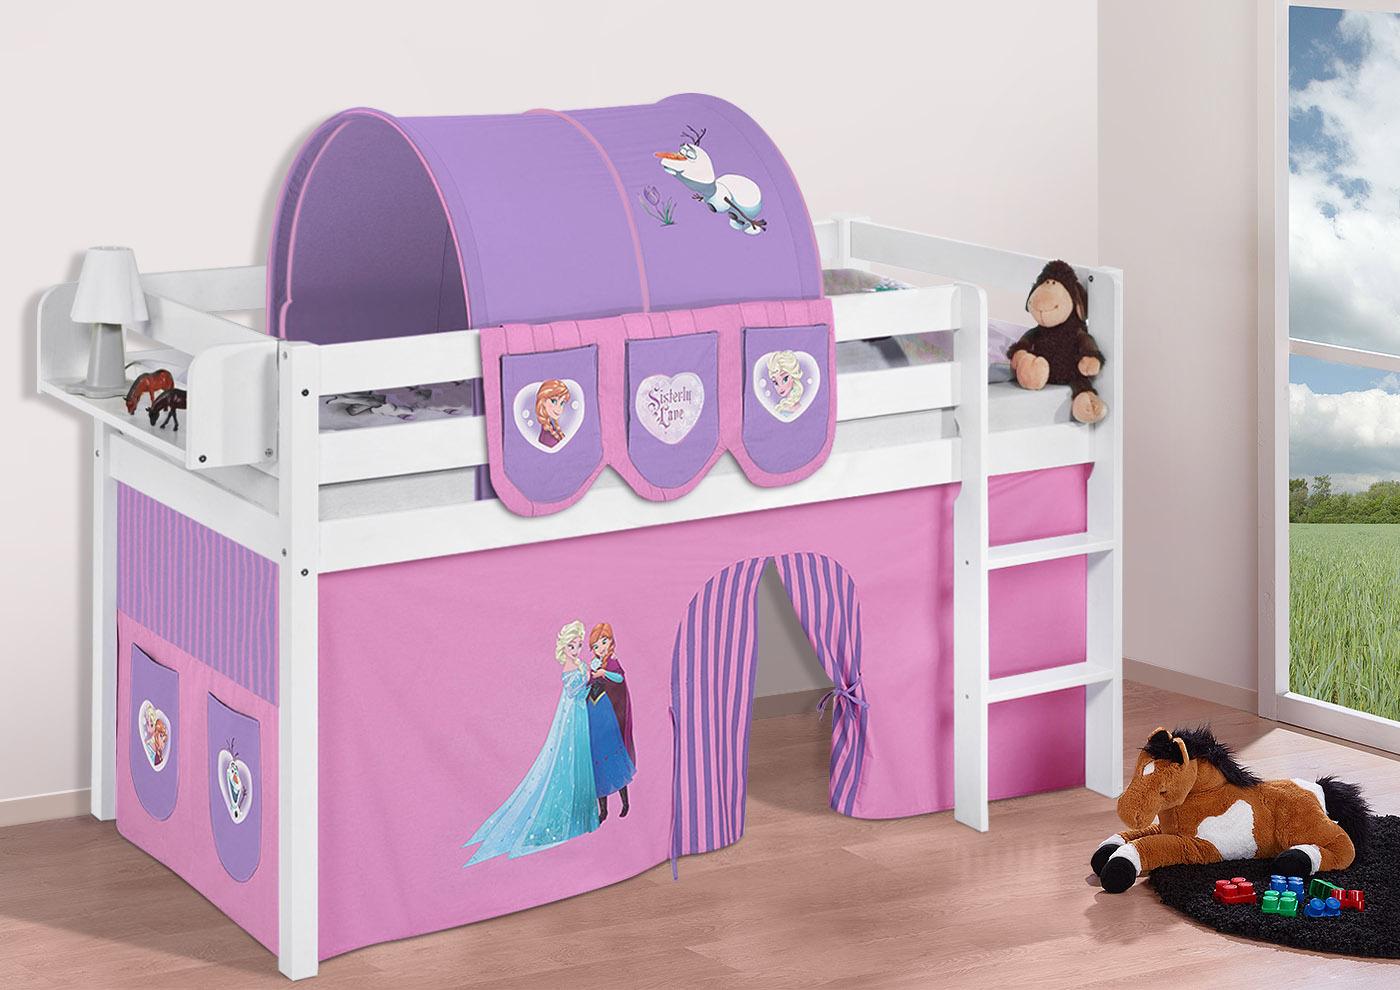 Spielbett hochbett kinderbett jelle buche massivholz vorhang lilokids ebay - Frozen vorhang hochbett ...